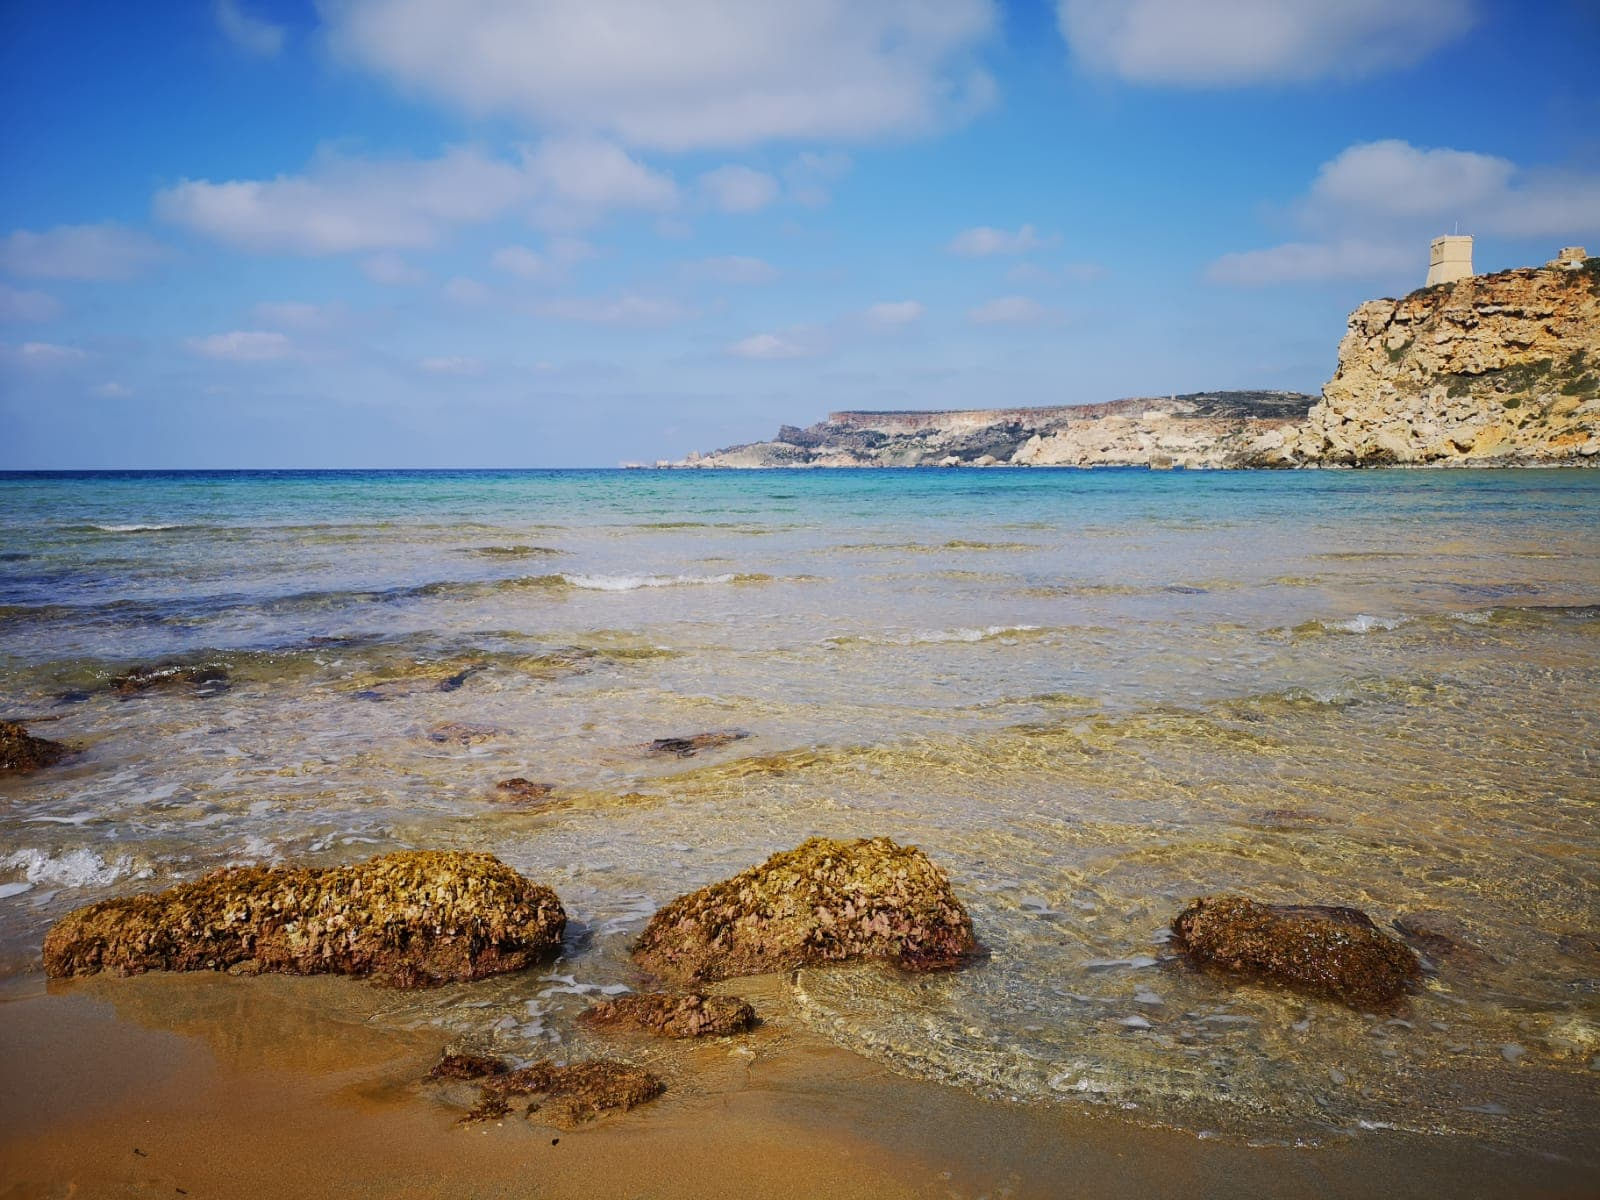 málta tengerpart 2021